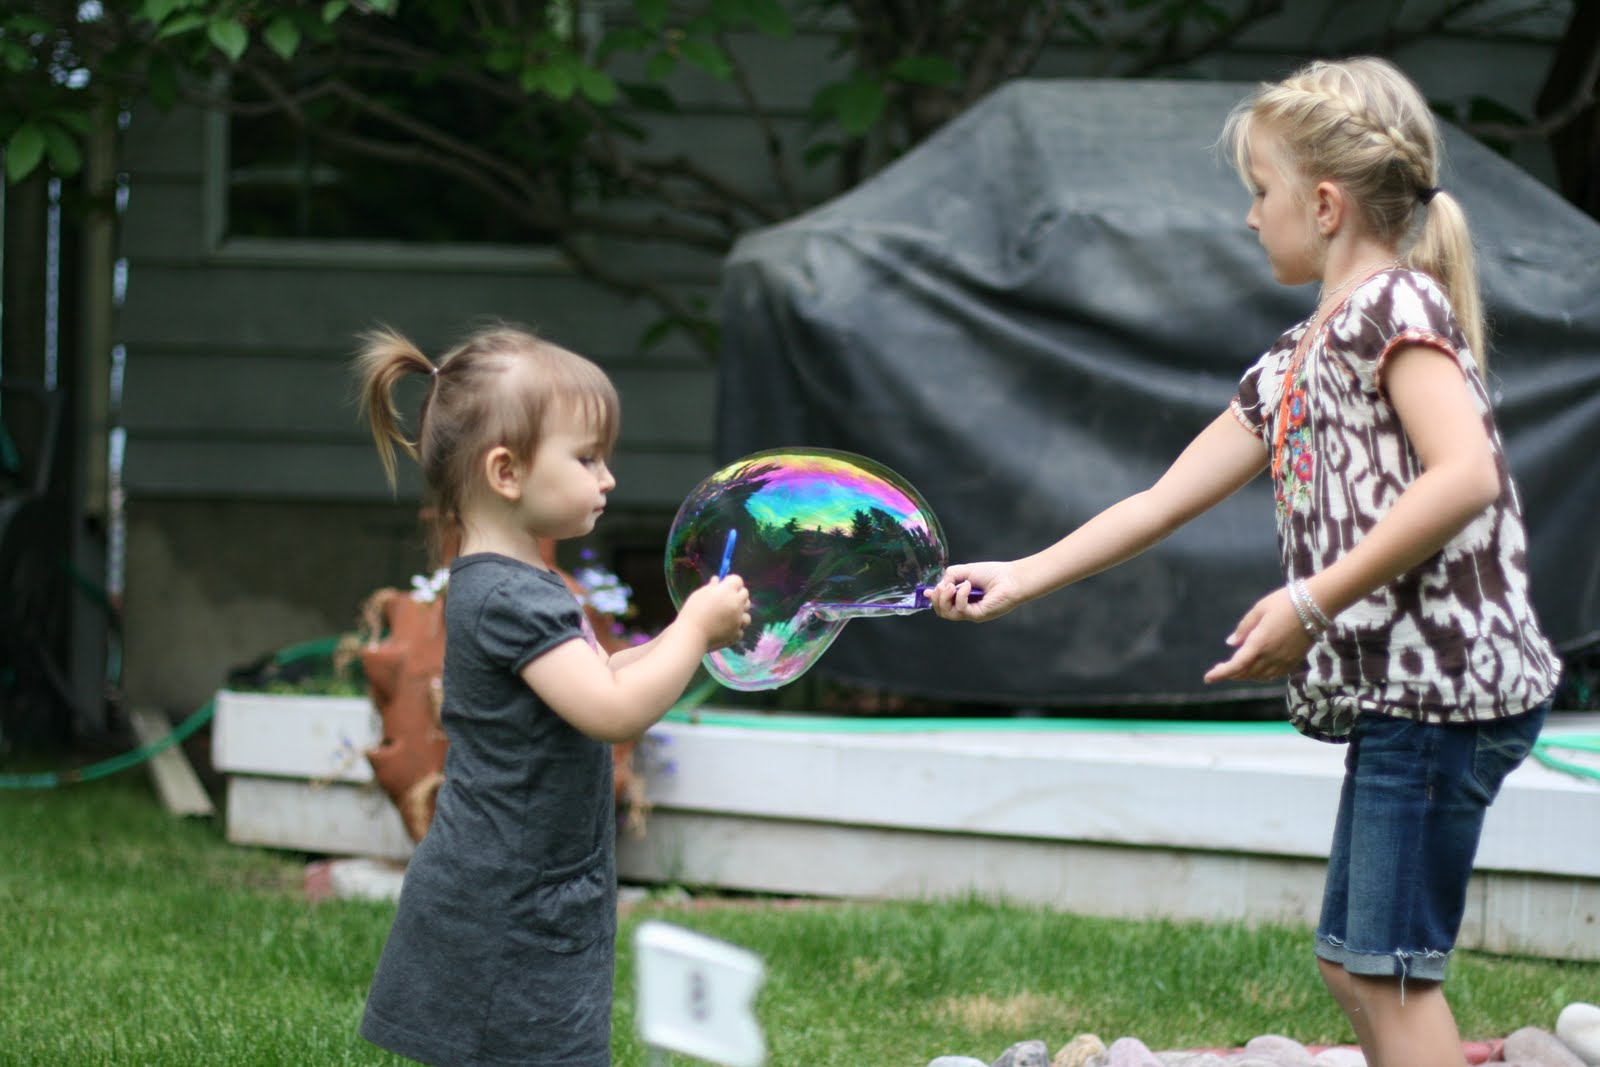 http://3.bp.blogspot.com/_A_a_pAVawuM/TEXgChkh2rI/AAAAAAAADME/WKTdie7KmIc/s1600/Calgary+Visit+2010+318.jpg